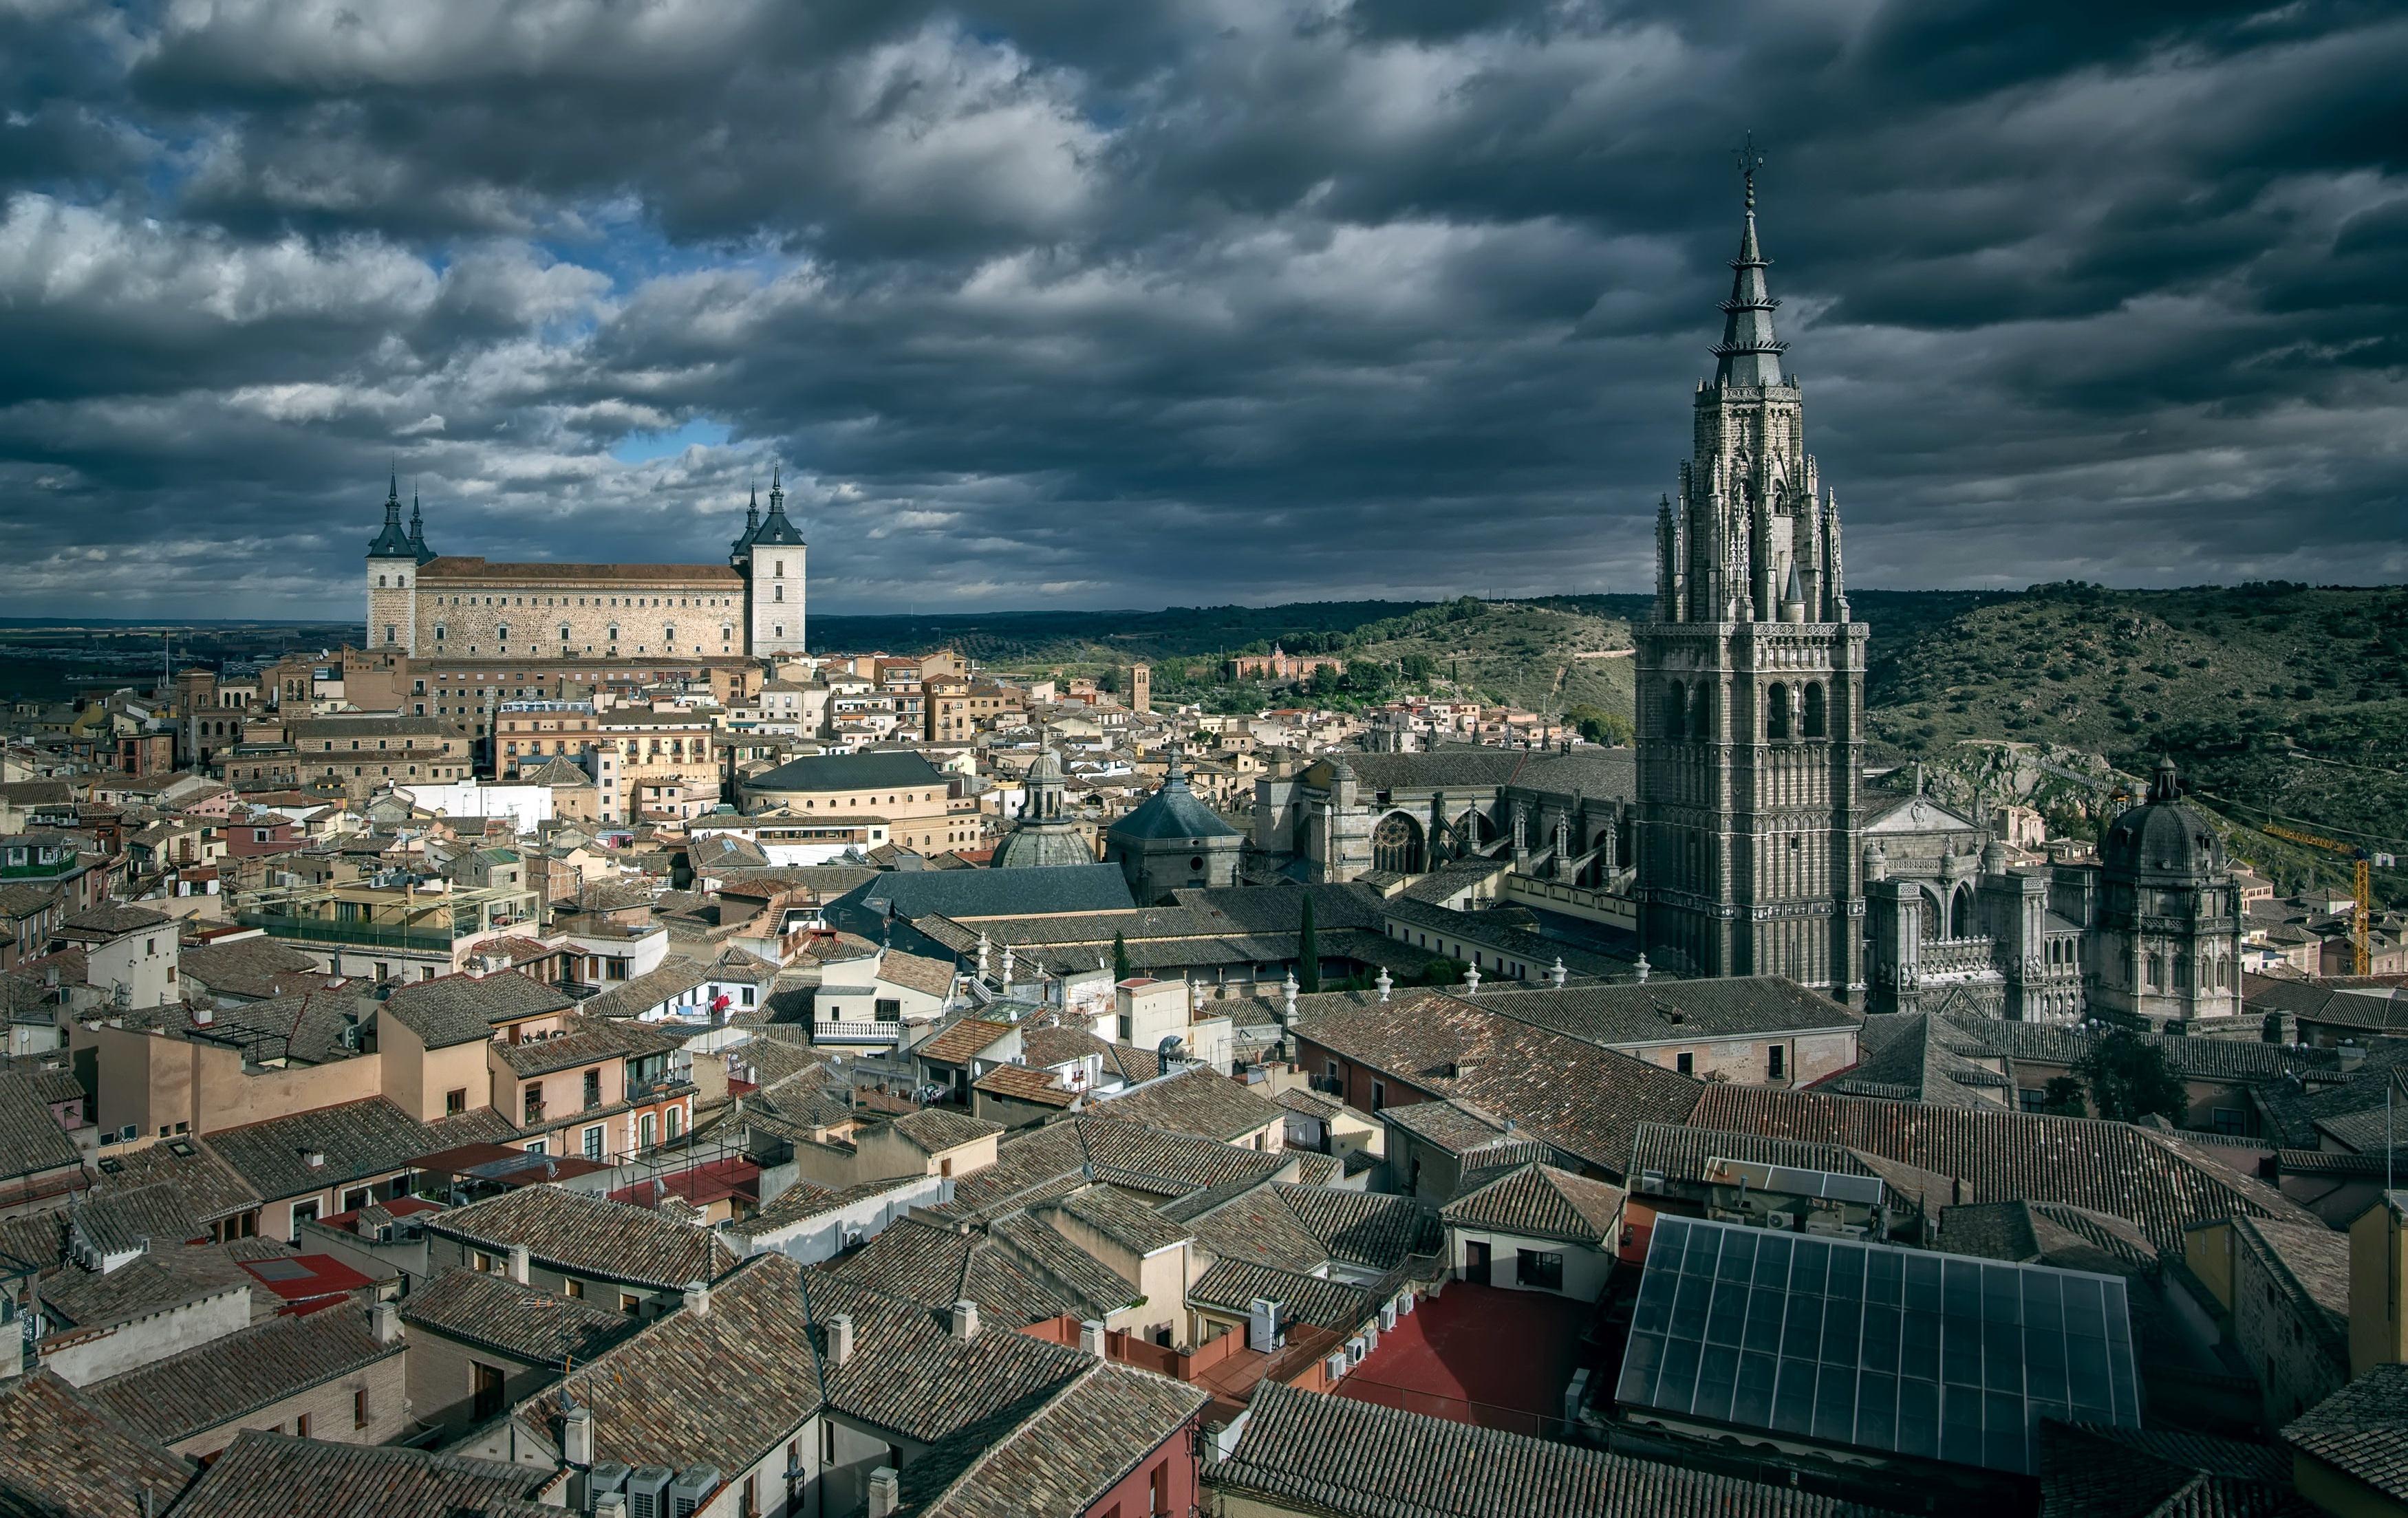 Фотография Толедо Испания башни Сверху город Здания Облака 3500x2207 Башня Дома облако Города облачно